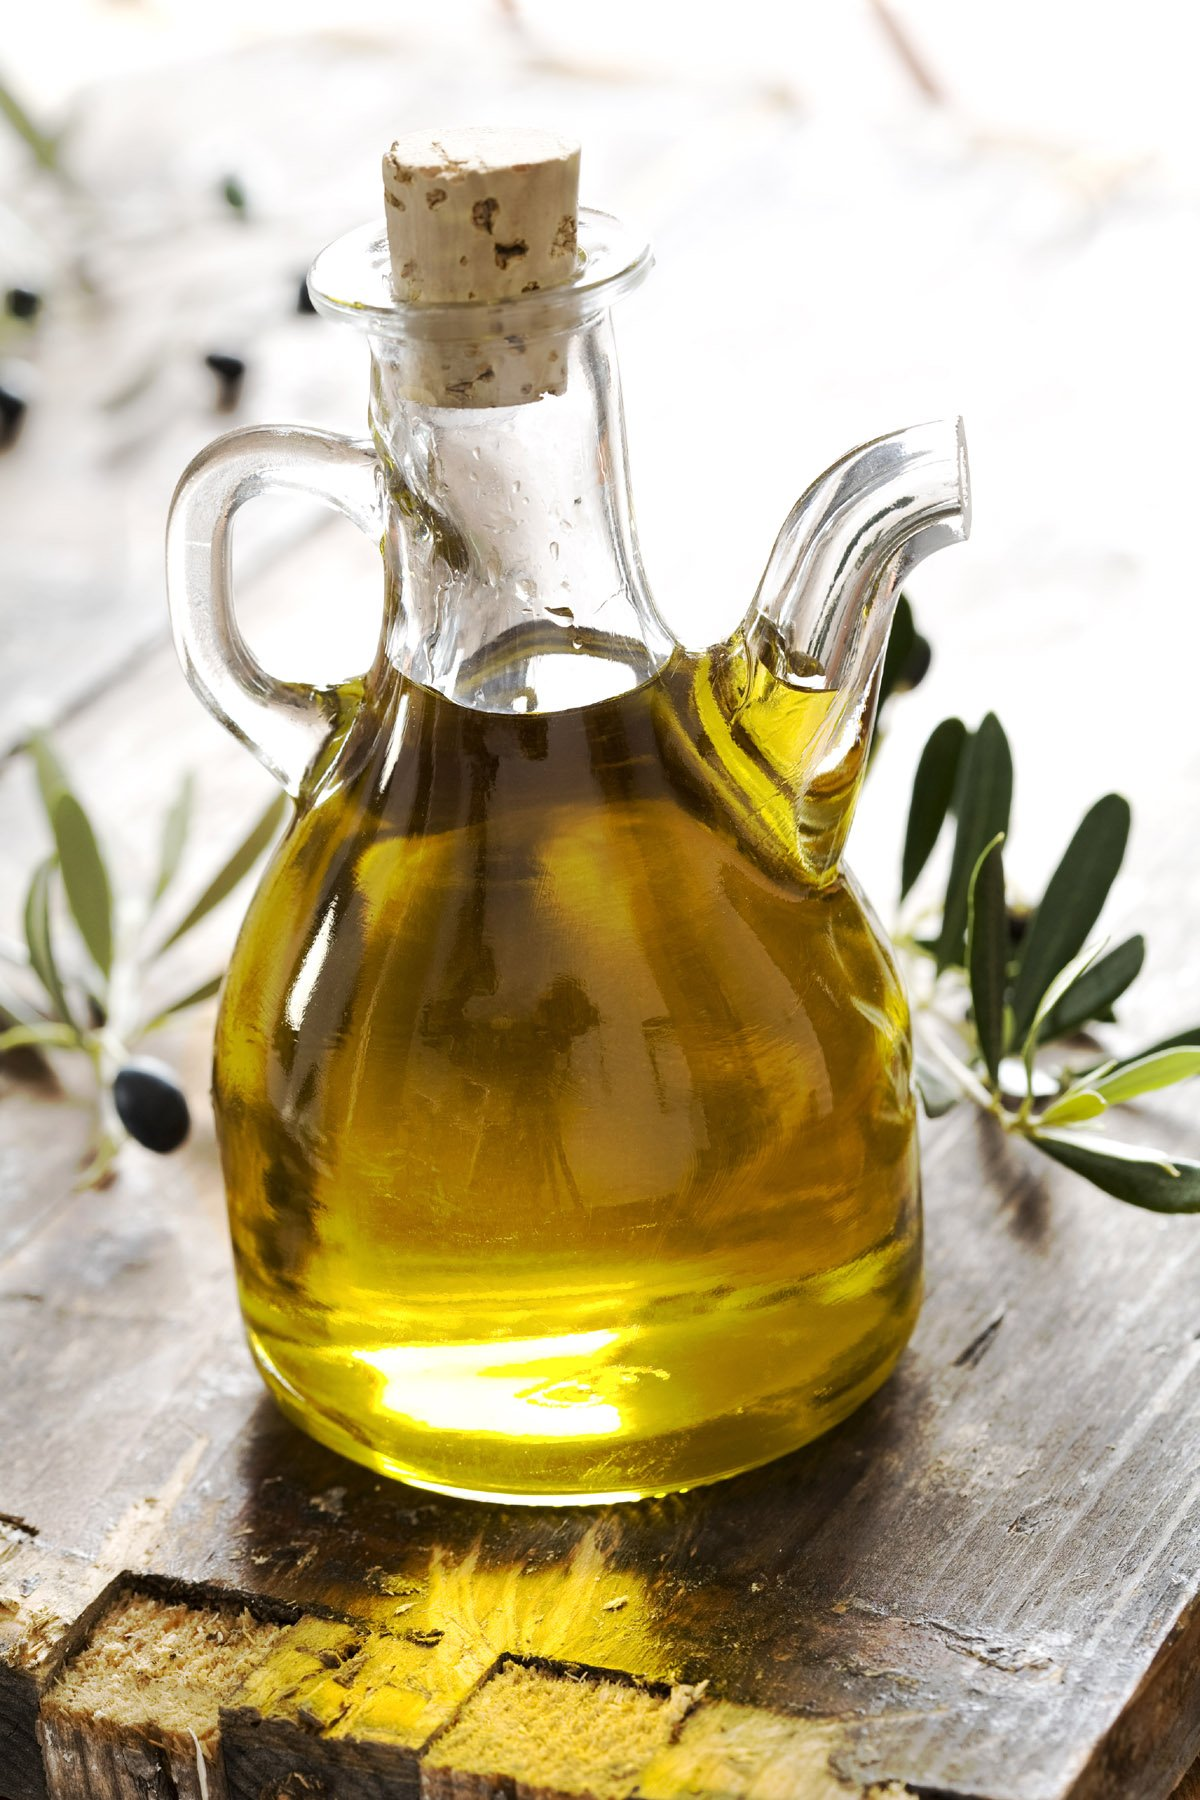 miglior olio d'oliva al mondo